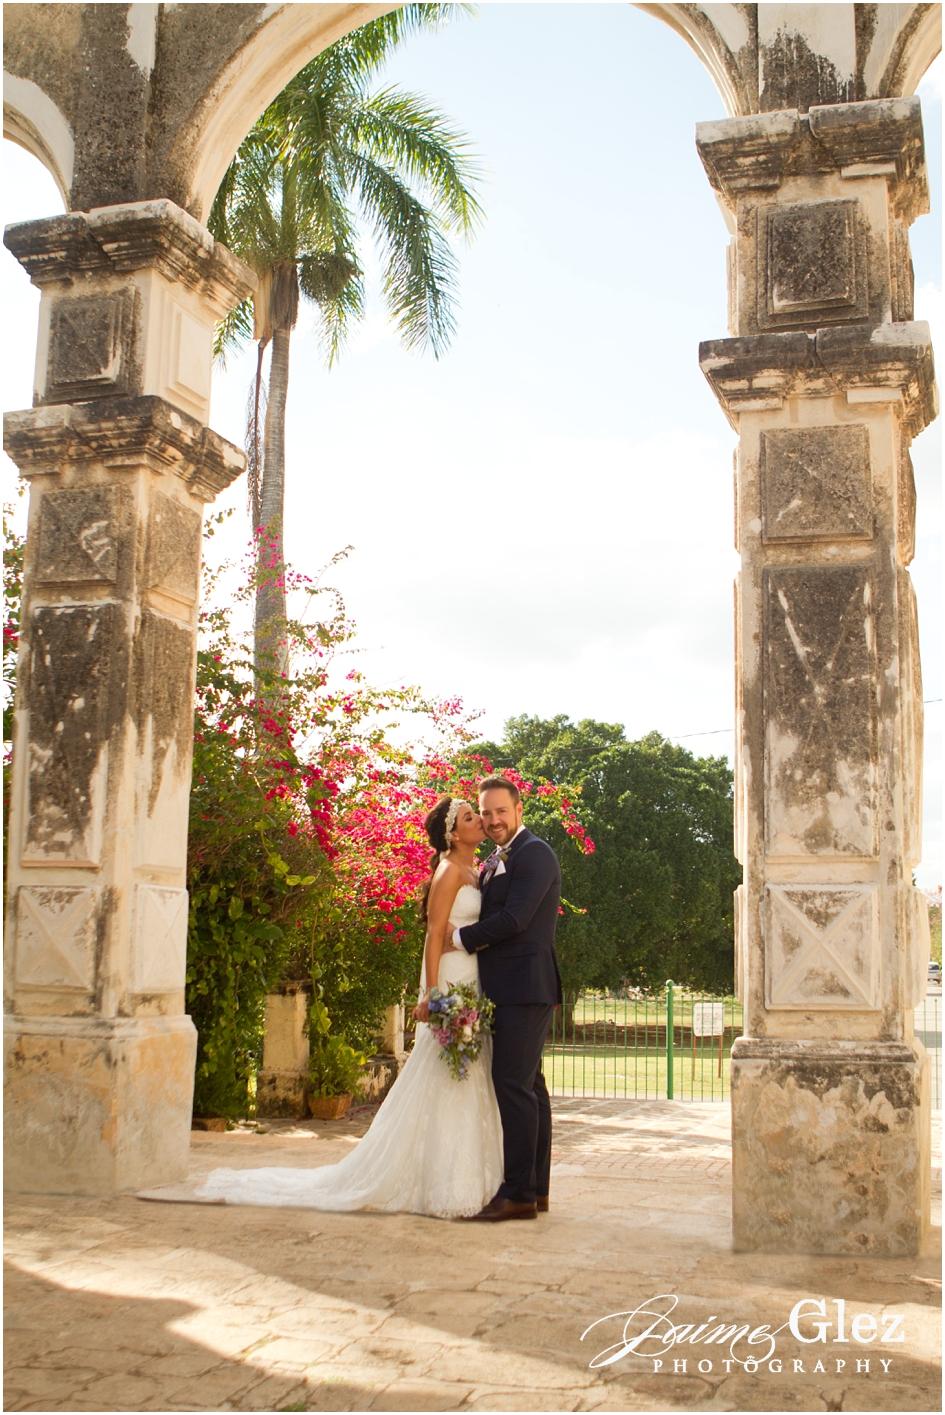 hacienda yaxcopoil boda yucatan mexico 11